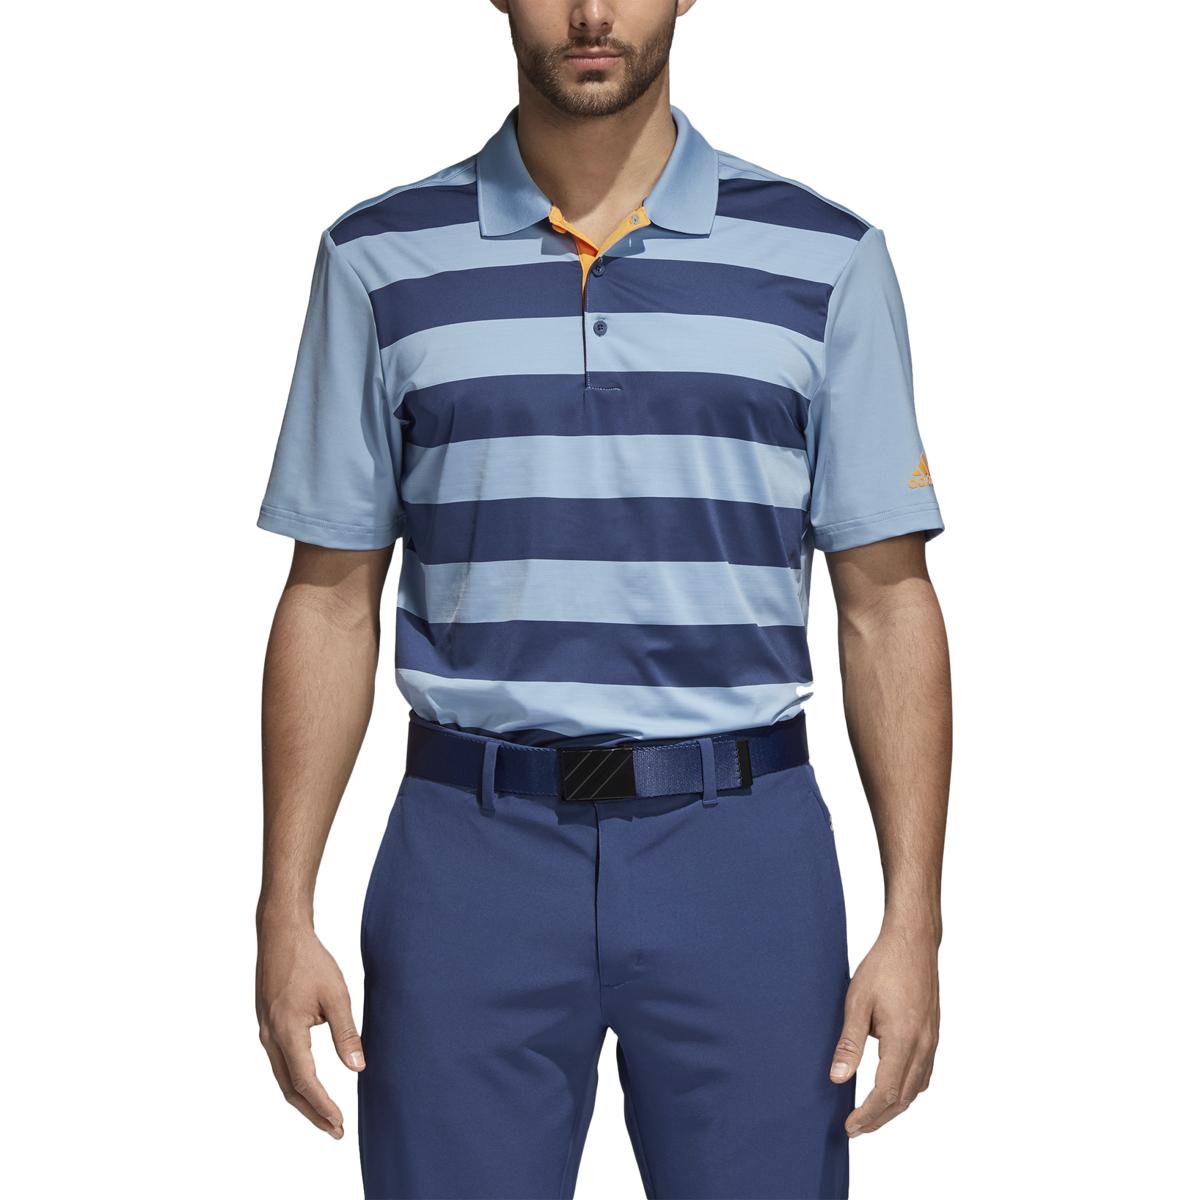 91b4d6e3 Adidas Ultimate 365 Rugby Stripe Polo - United MileagePlus Golf